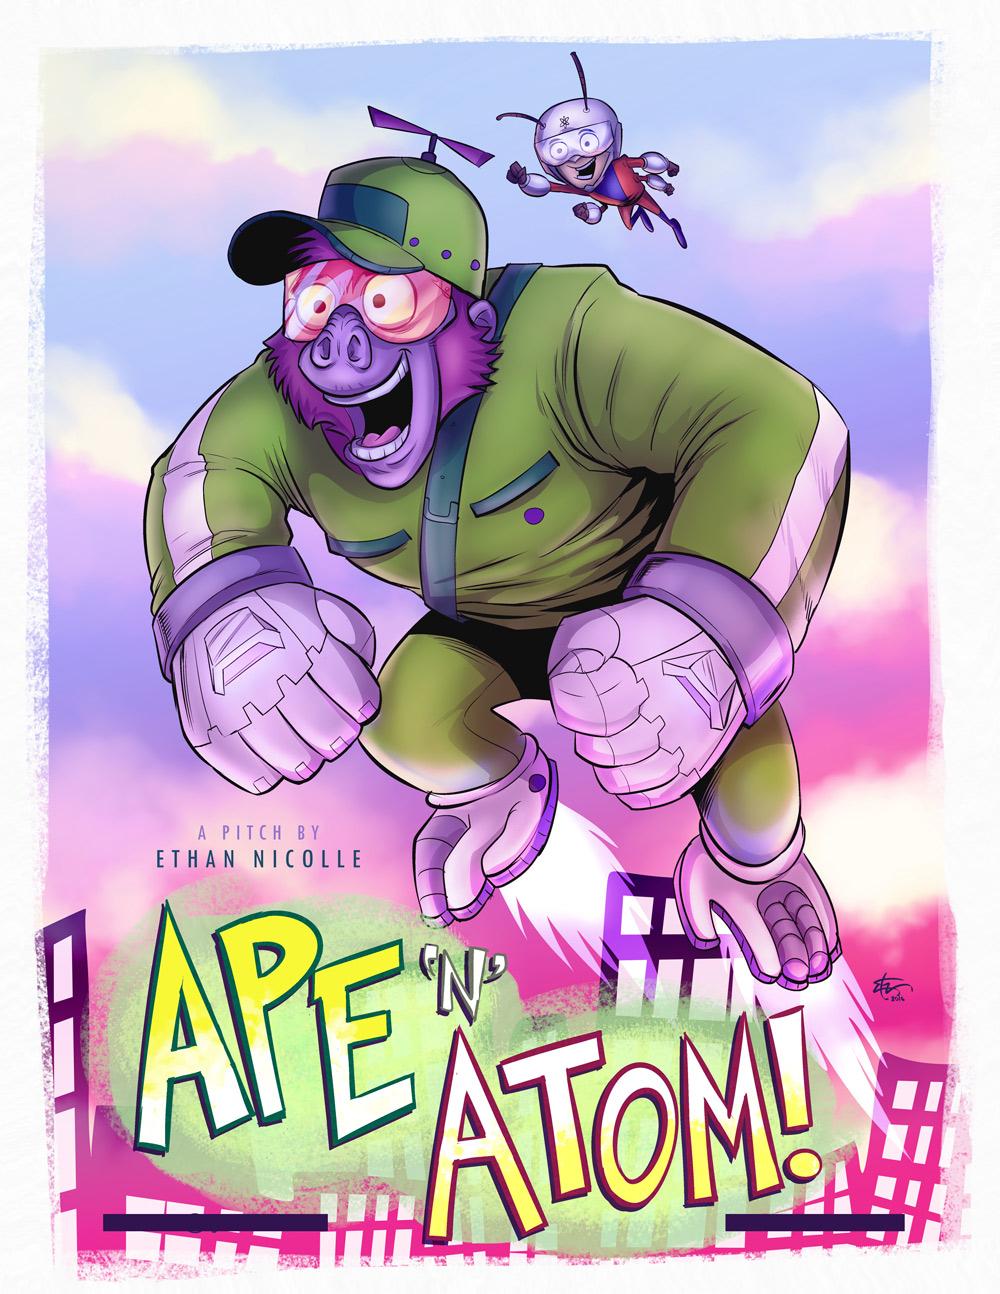 ApeNAtom-1